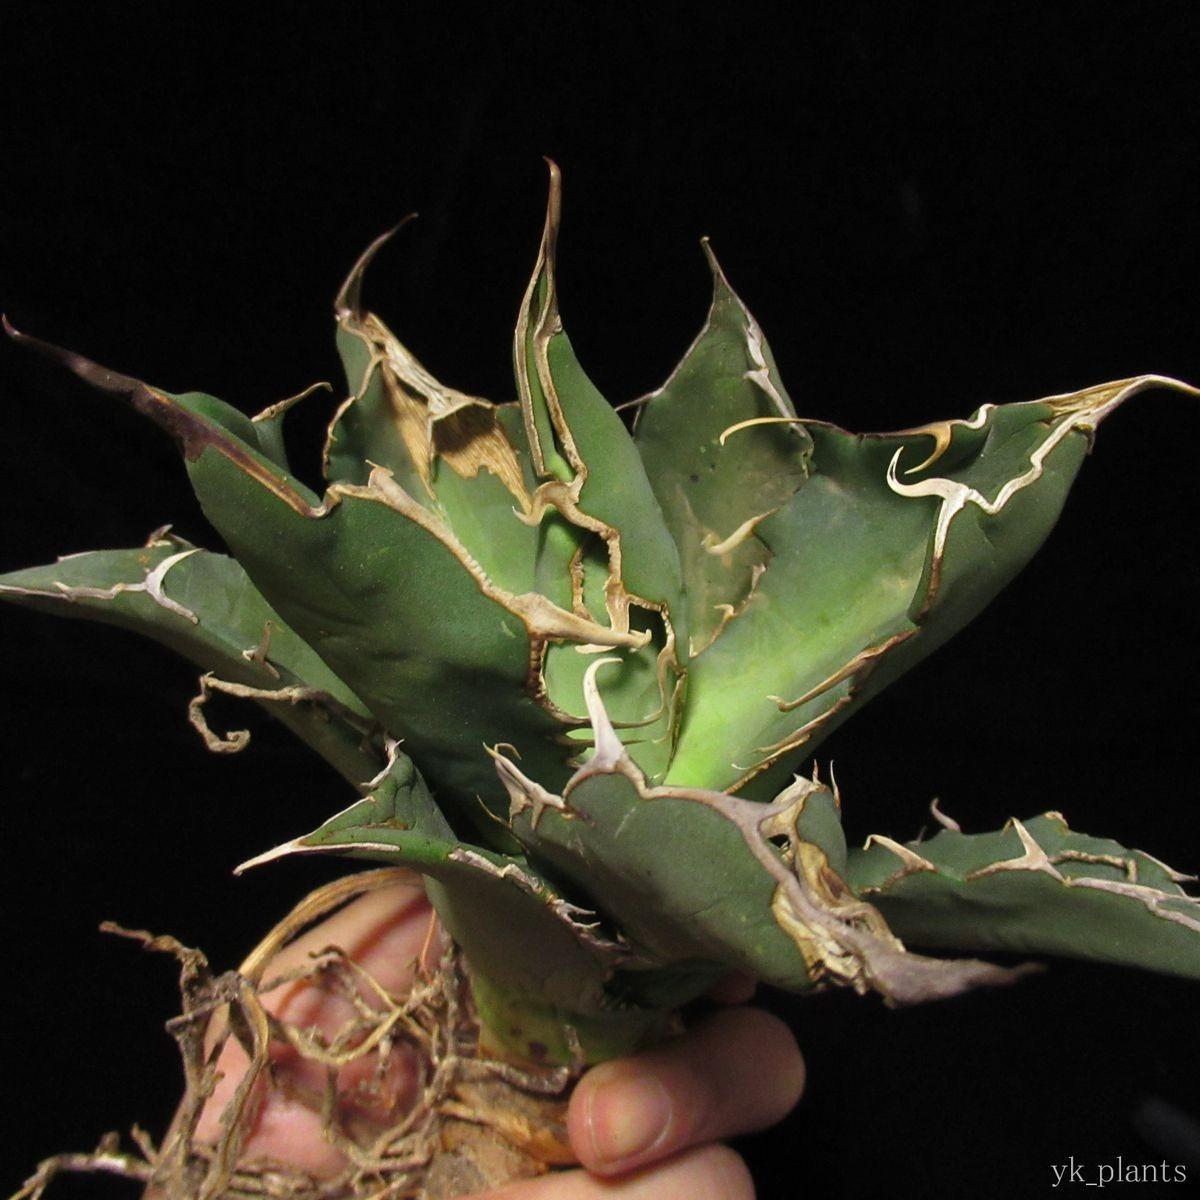 #29 Agave titanota FO-076 Sierra Mixteca アガベ チタノタ FO-76 ( 塊根植物 コーデックス 多肉植物 好きにも